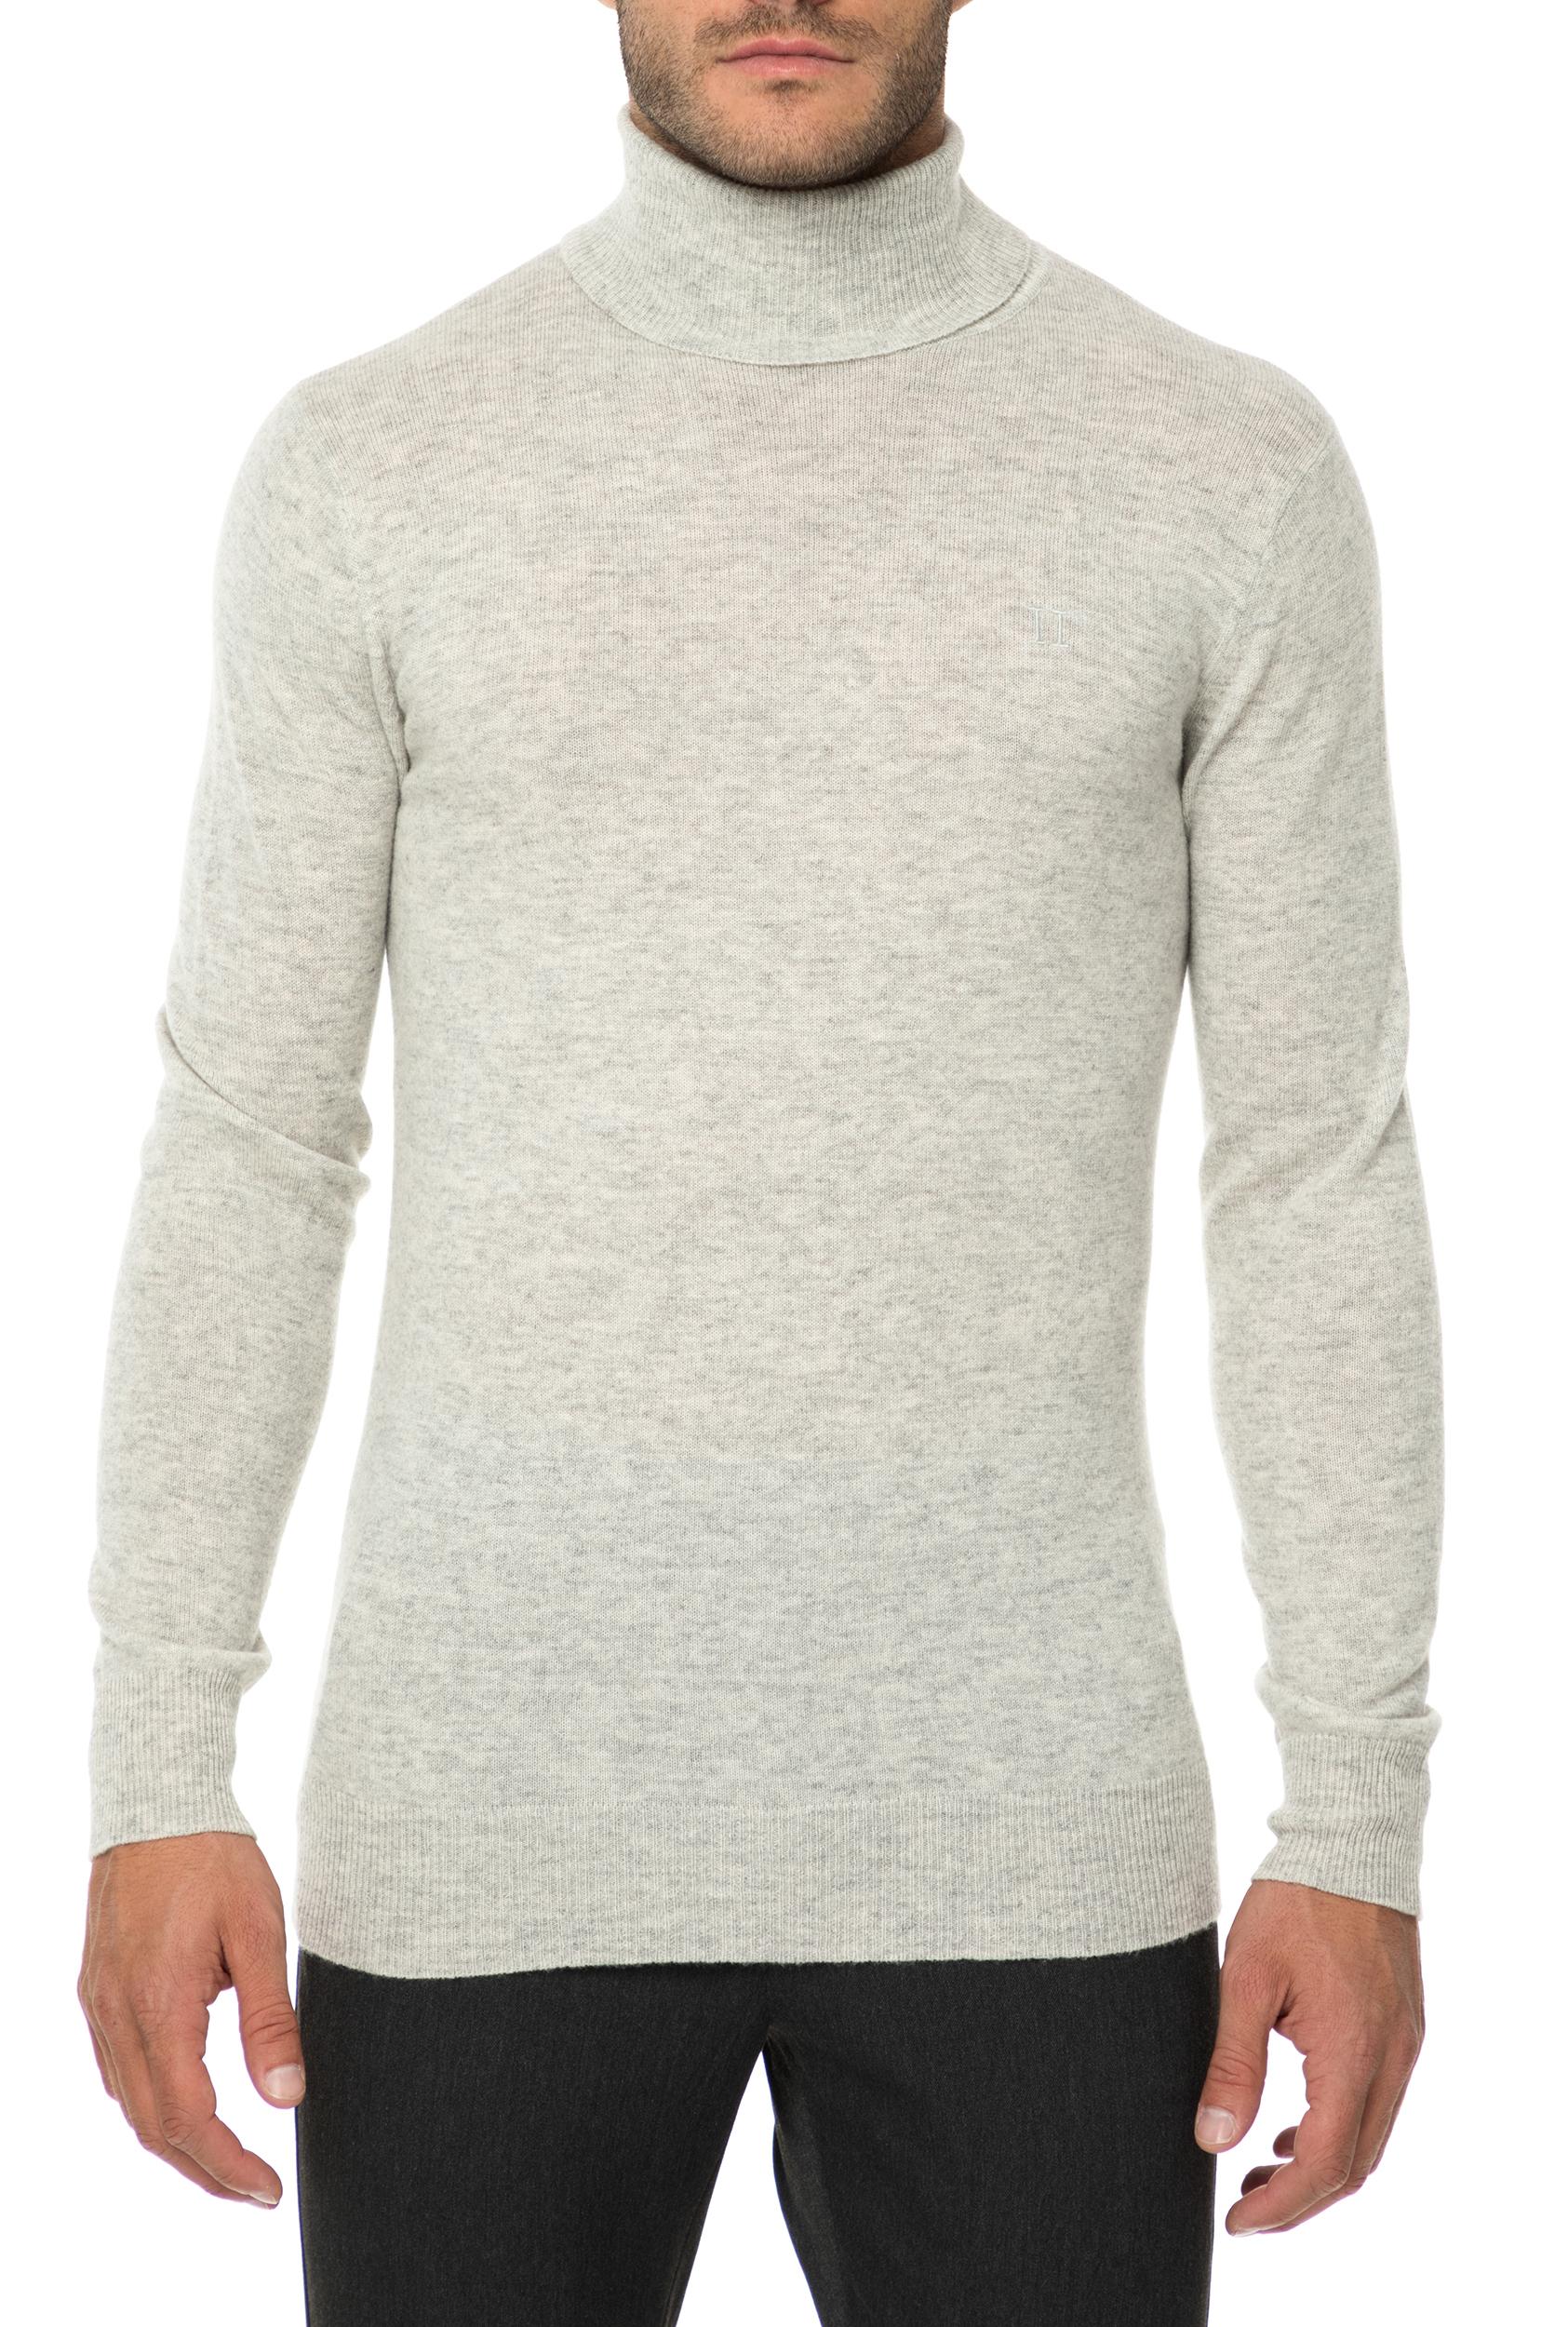 078b10ae2405 CollectiveOnline LES DEUX - Ανδρική ζιβάγκο μπλούζα LES DEUX γκρι